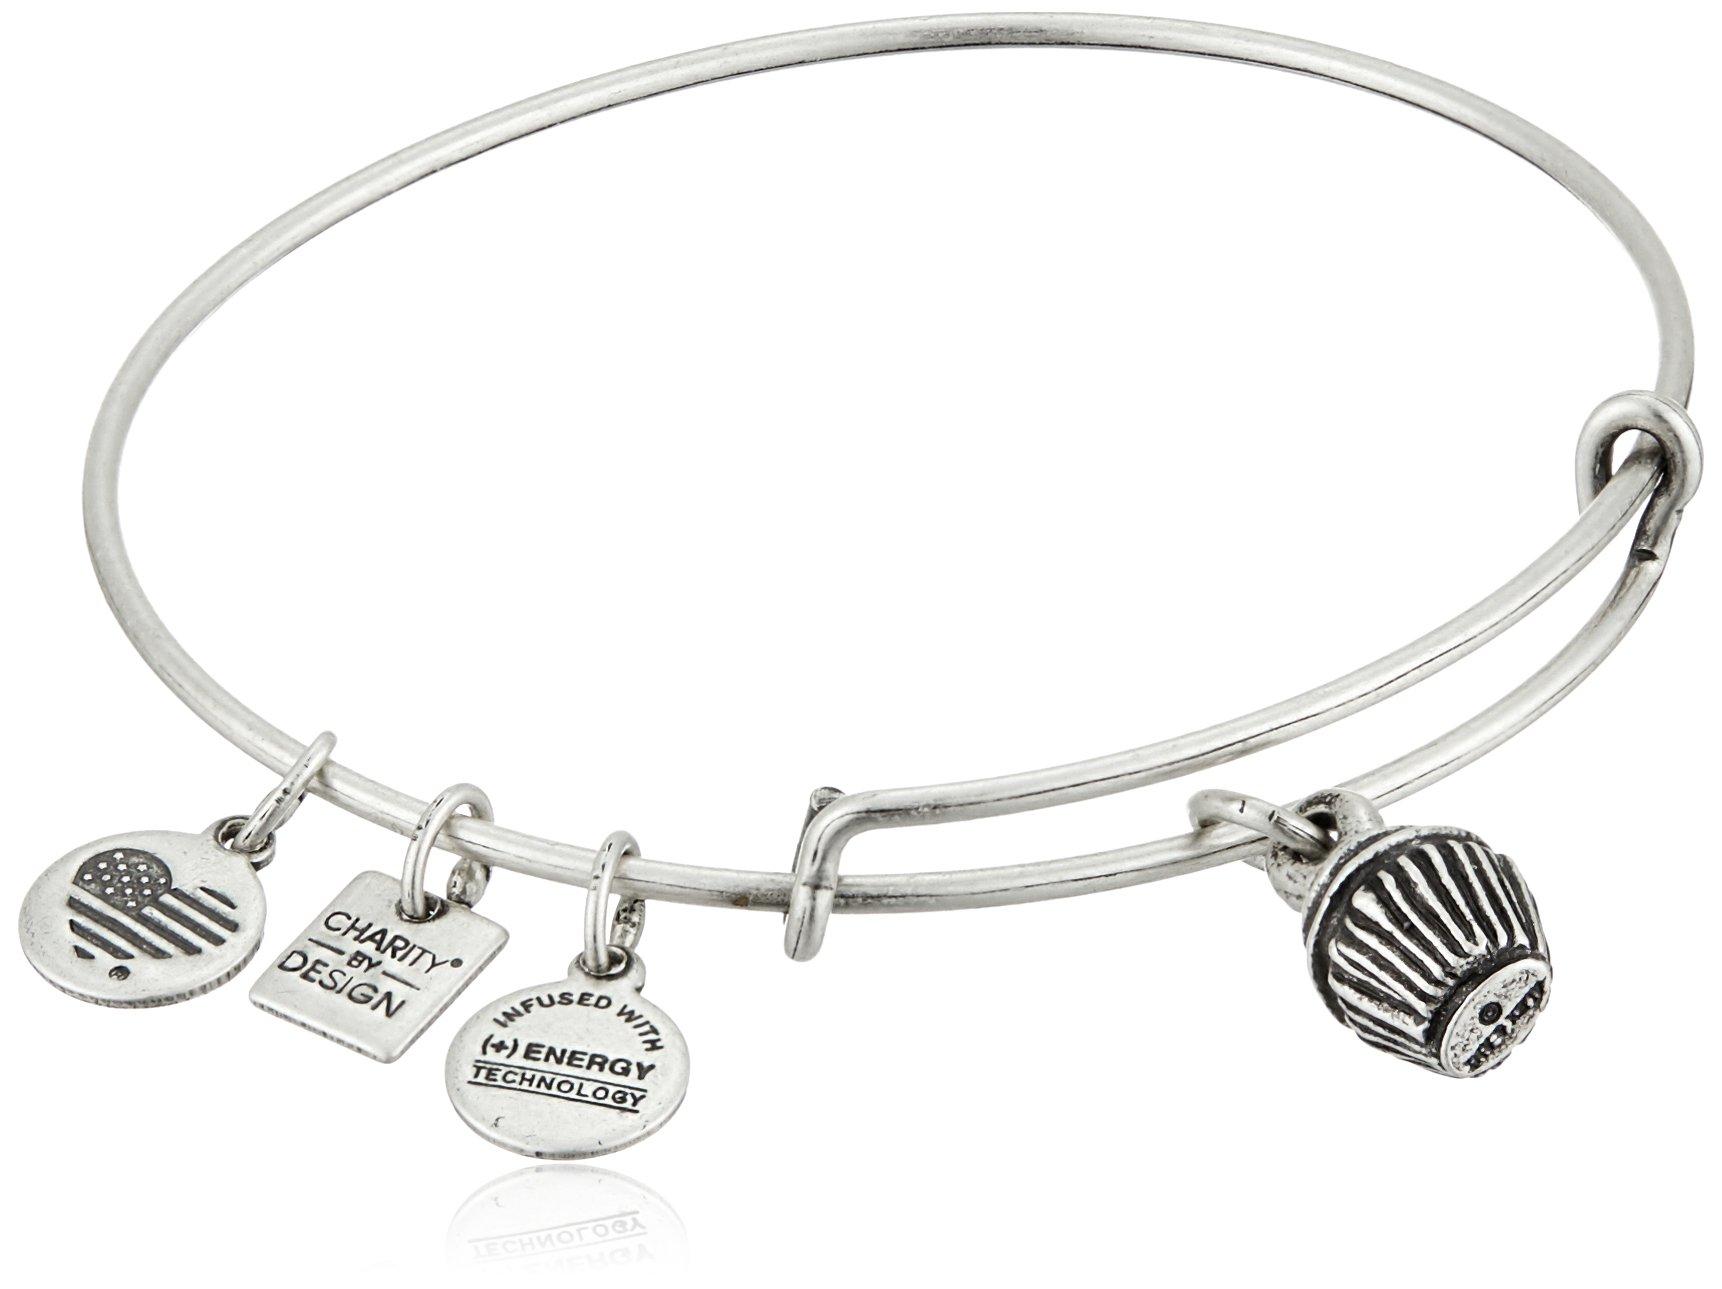 Alex and Ani Charity By Design Cupcake Rafaelian Silver Bangle Bracelet